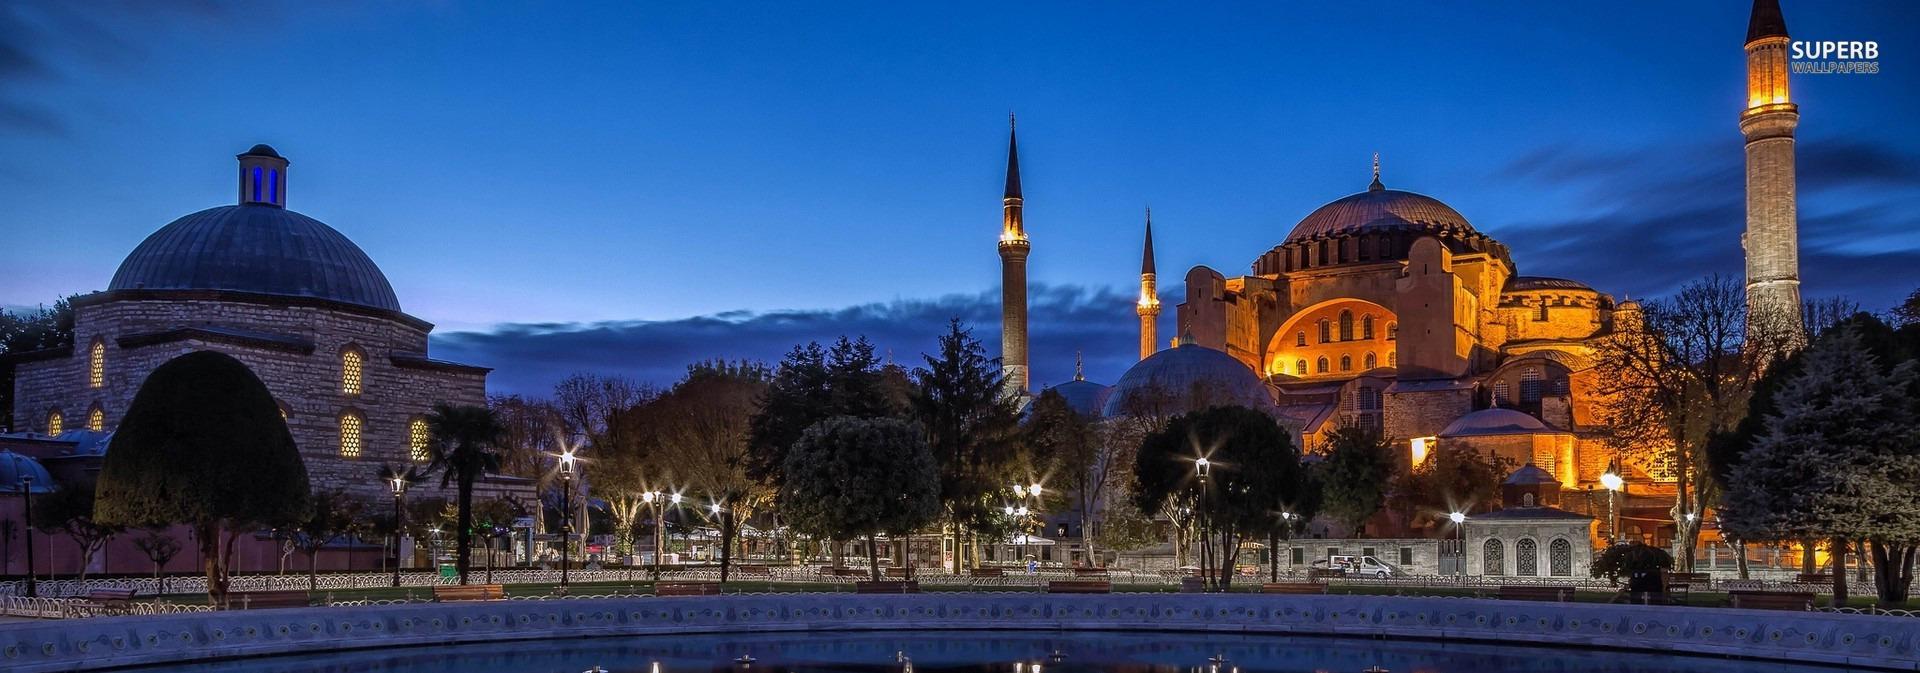 ISTANBUL NOVA GODINA 2019 BUS